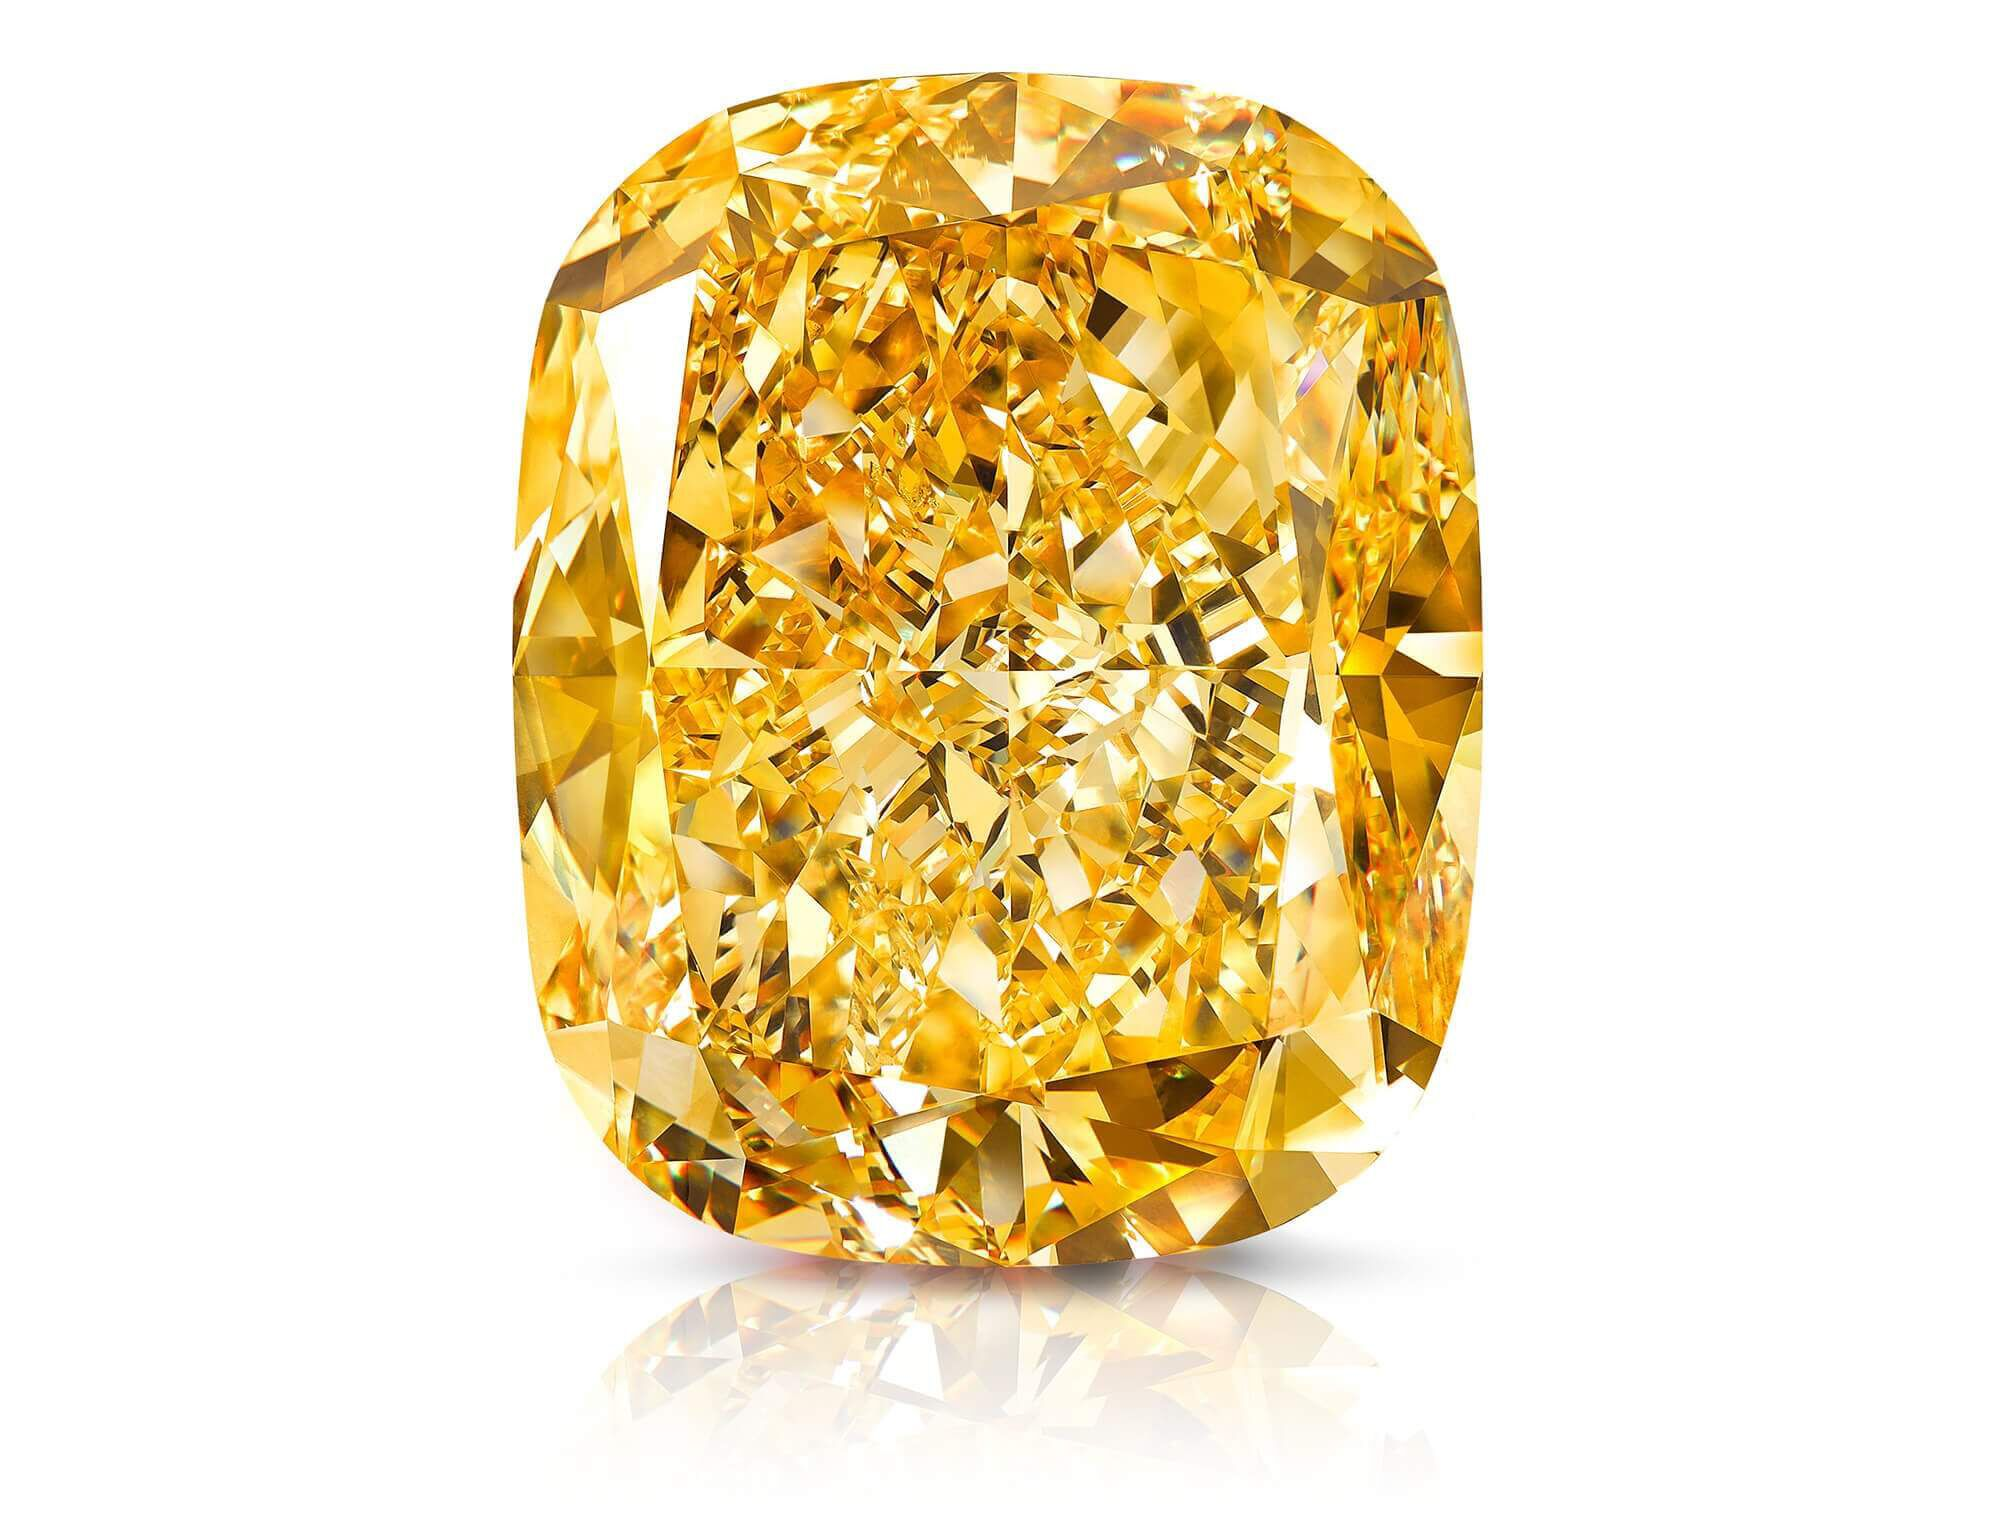 The Golden Empress yellow diamond by Graff